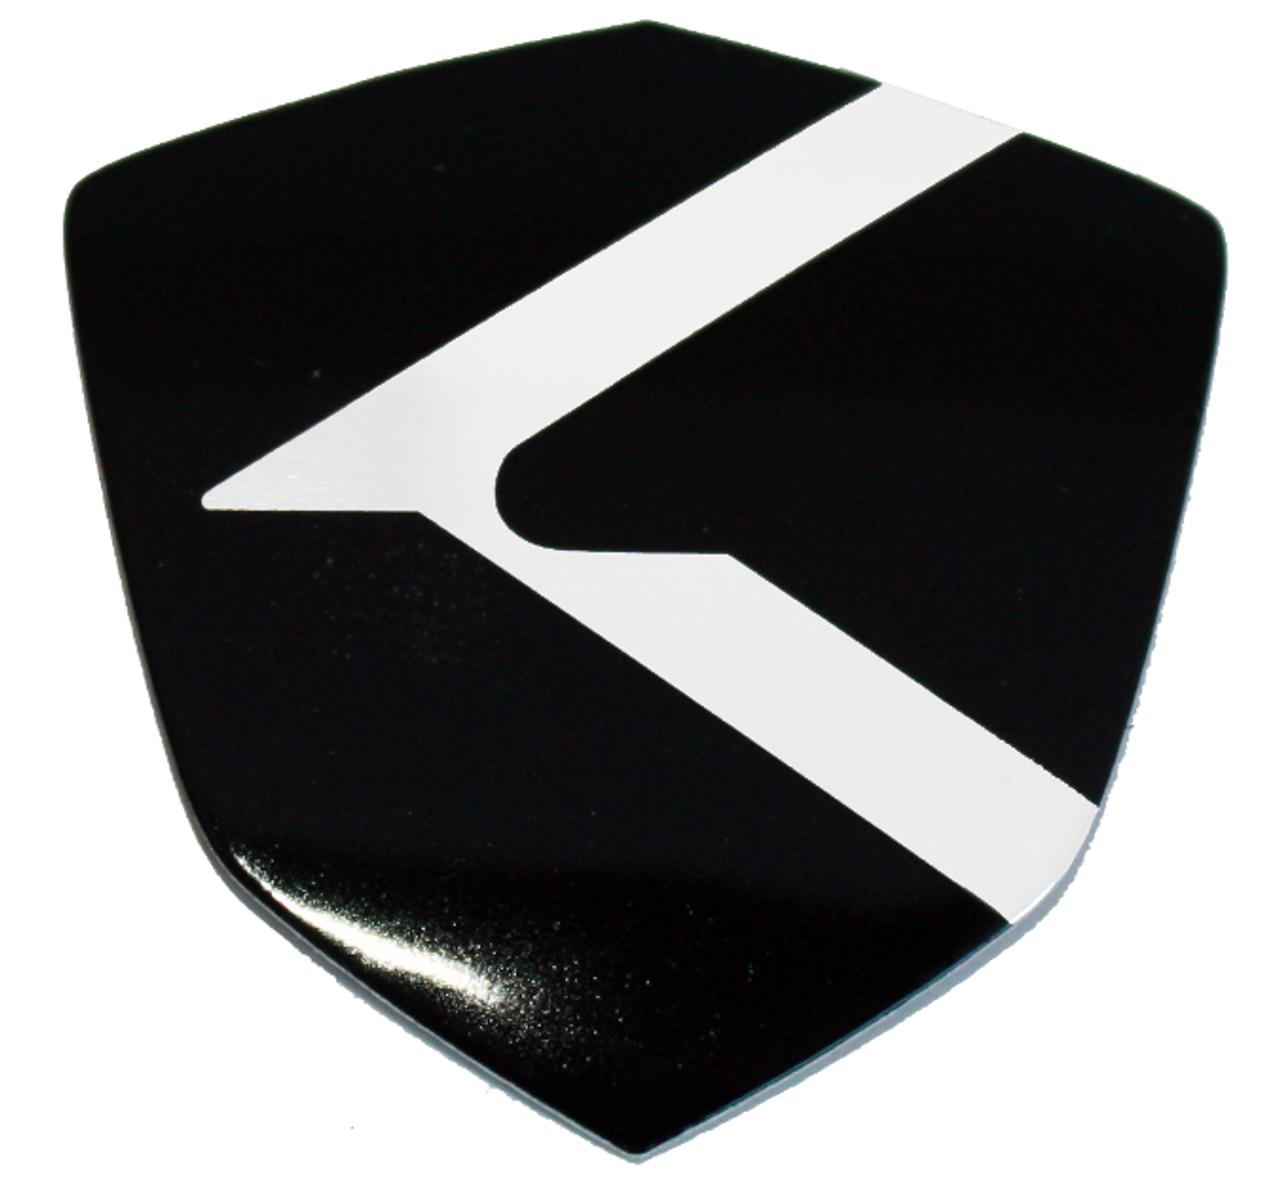 K Shield emblem badge logo for Kia and Hyundai models Optima Cadenza K900 Forte Rio Sorento Sportage